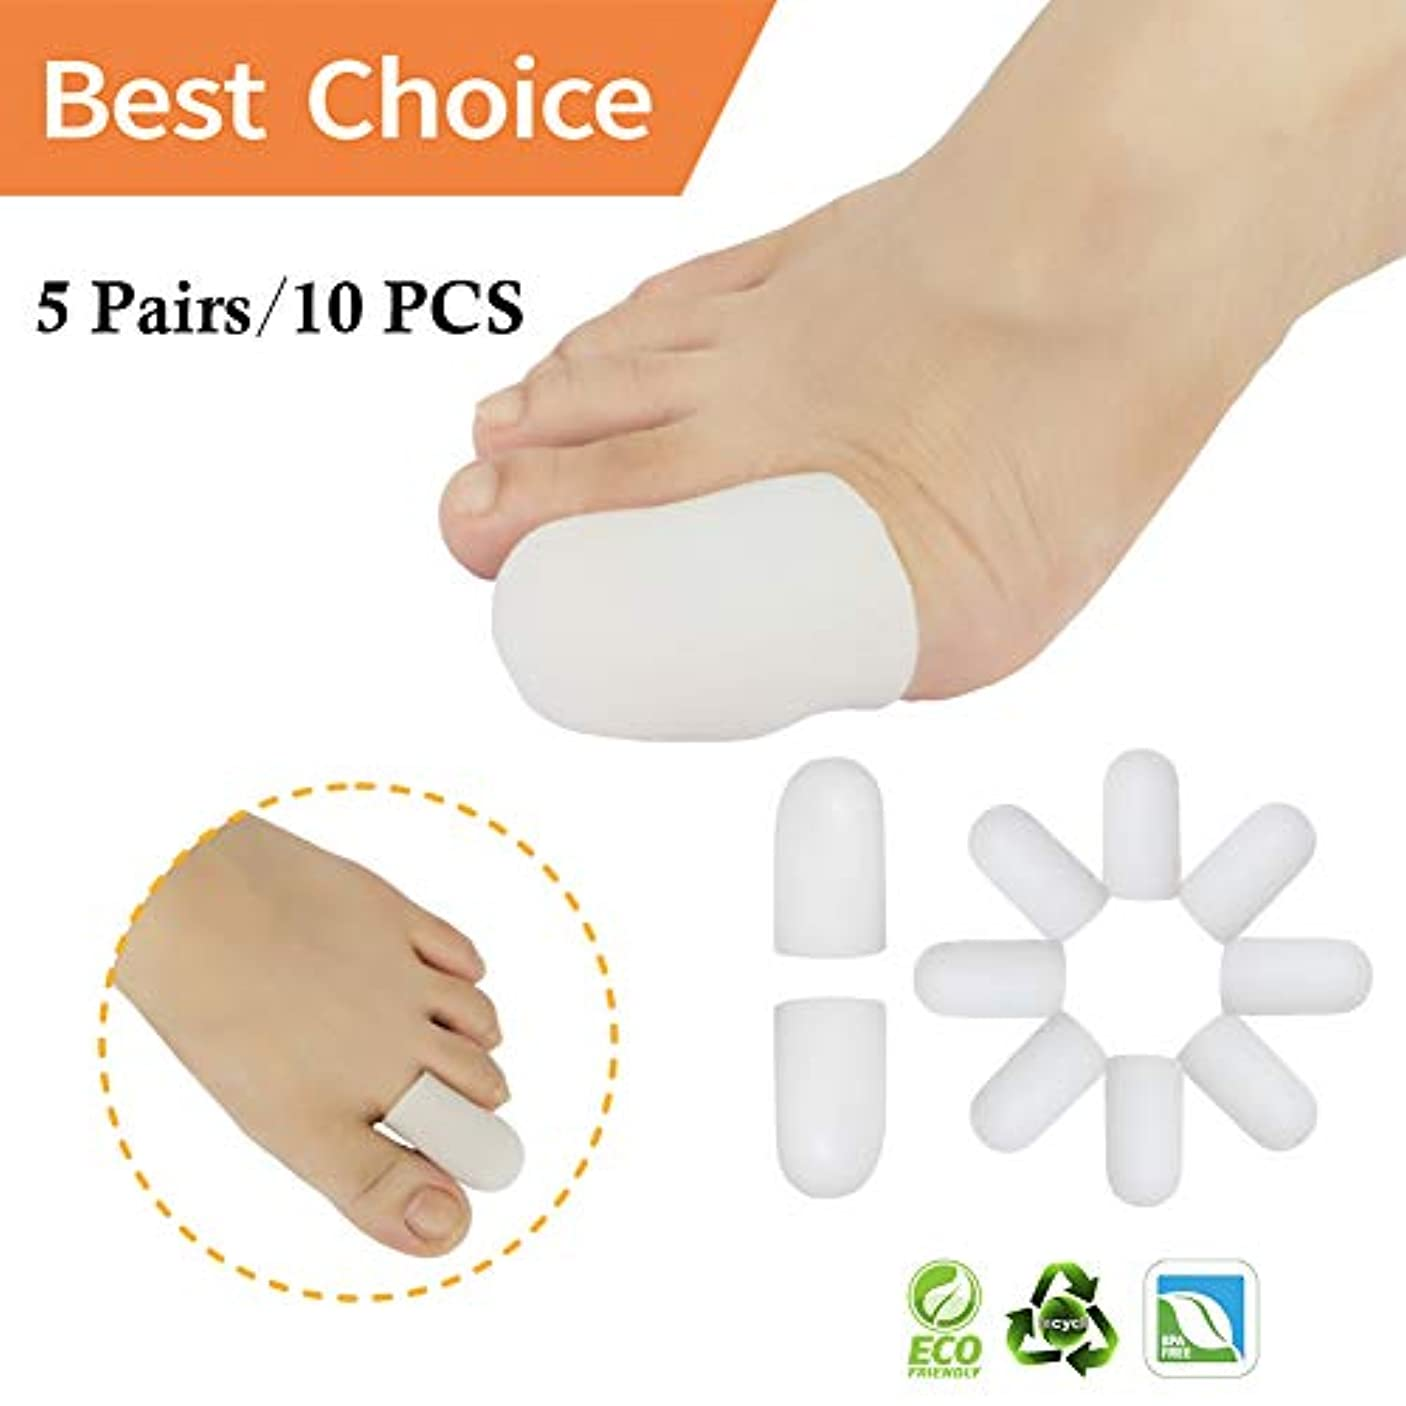 Pnrskter ジェル 足指 キャップ プロテクター 水疱用、つま先保護摩擦疼痛緩和10個入り